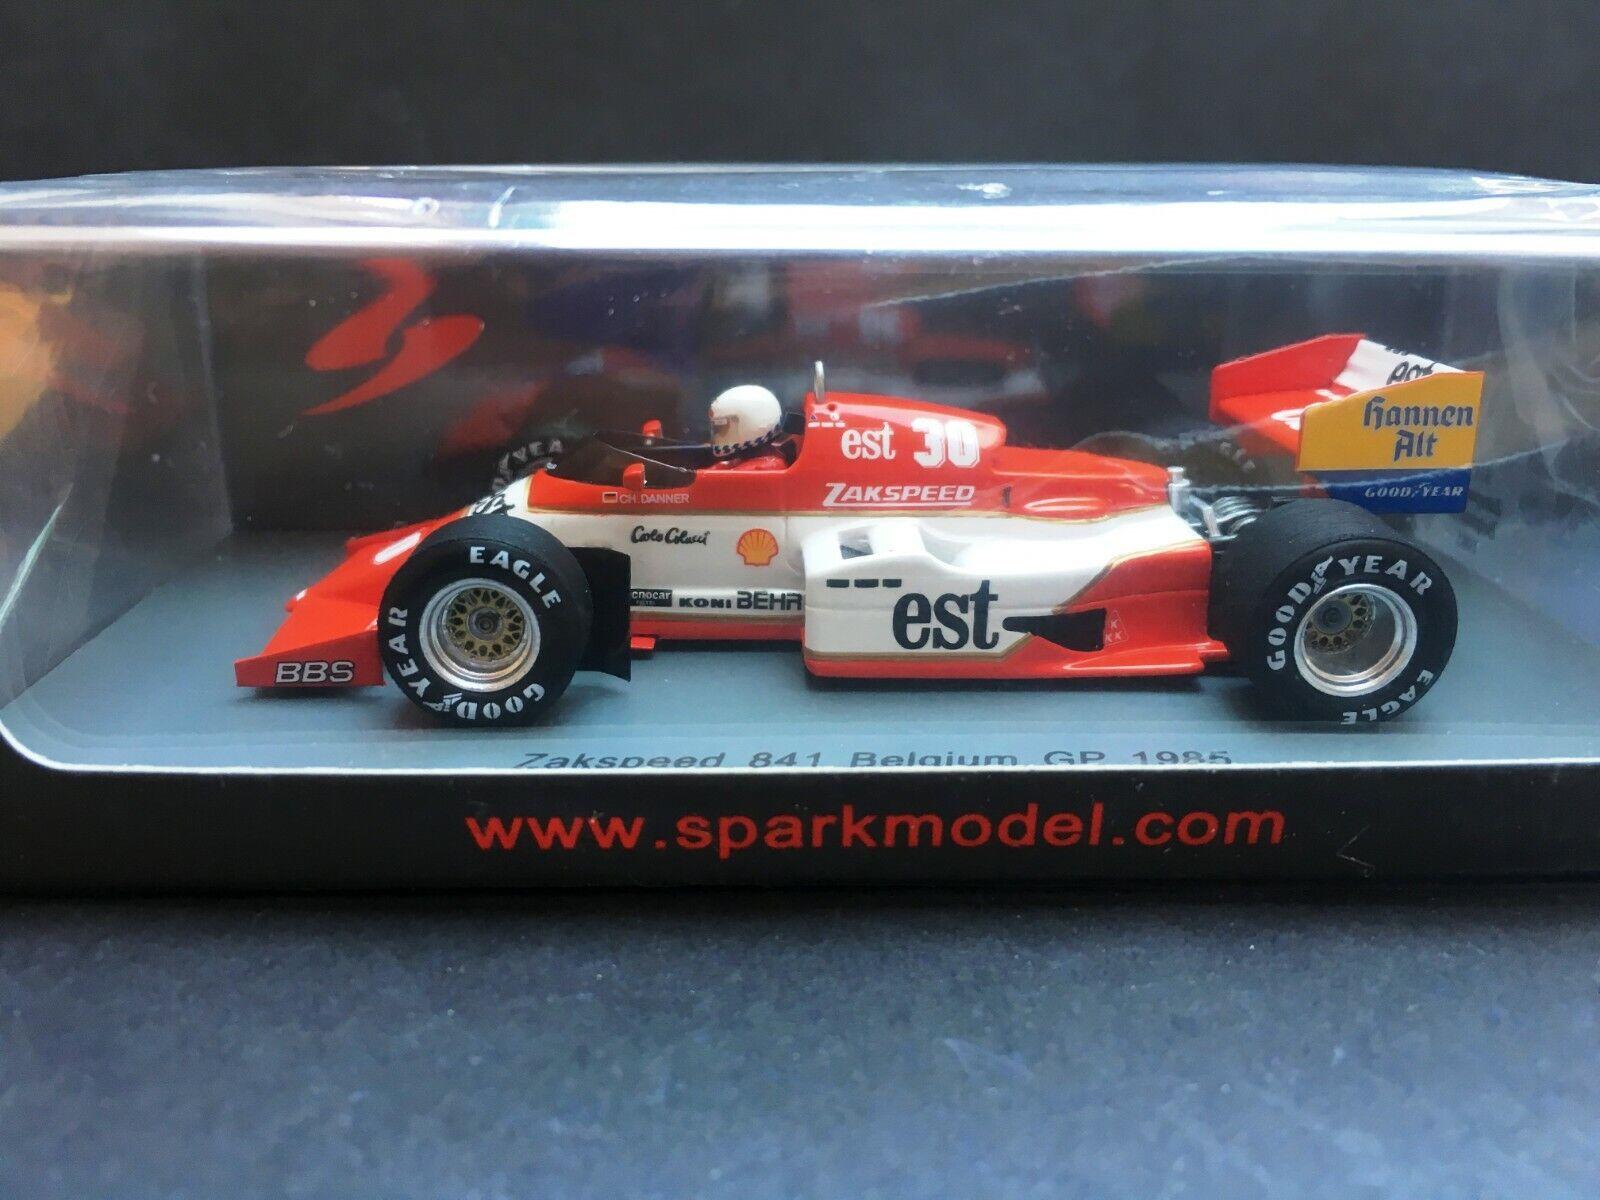 a la venta Spark - Christian Danner - Zakspeed Zakspeed Zakspeed - 841 - Belgium GP - 1 43 - 1985  online al mejor precio